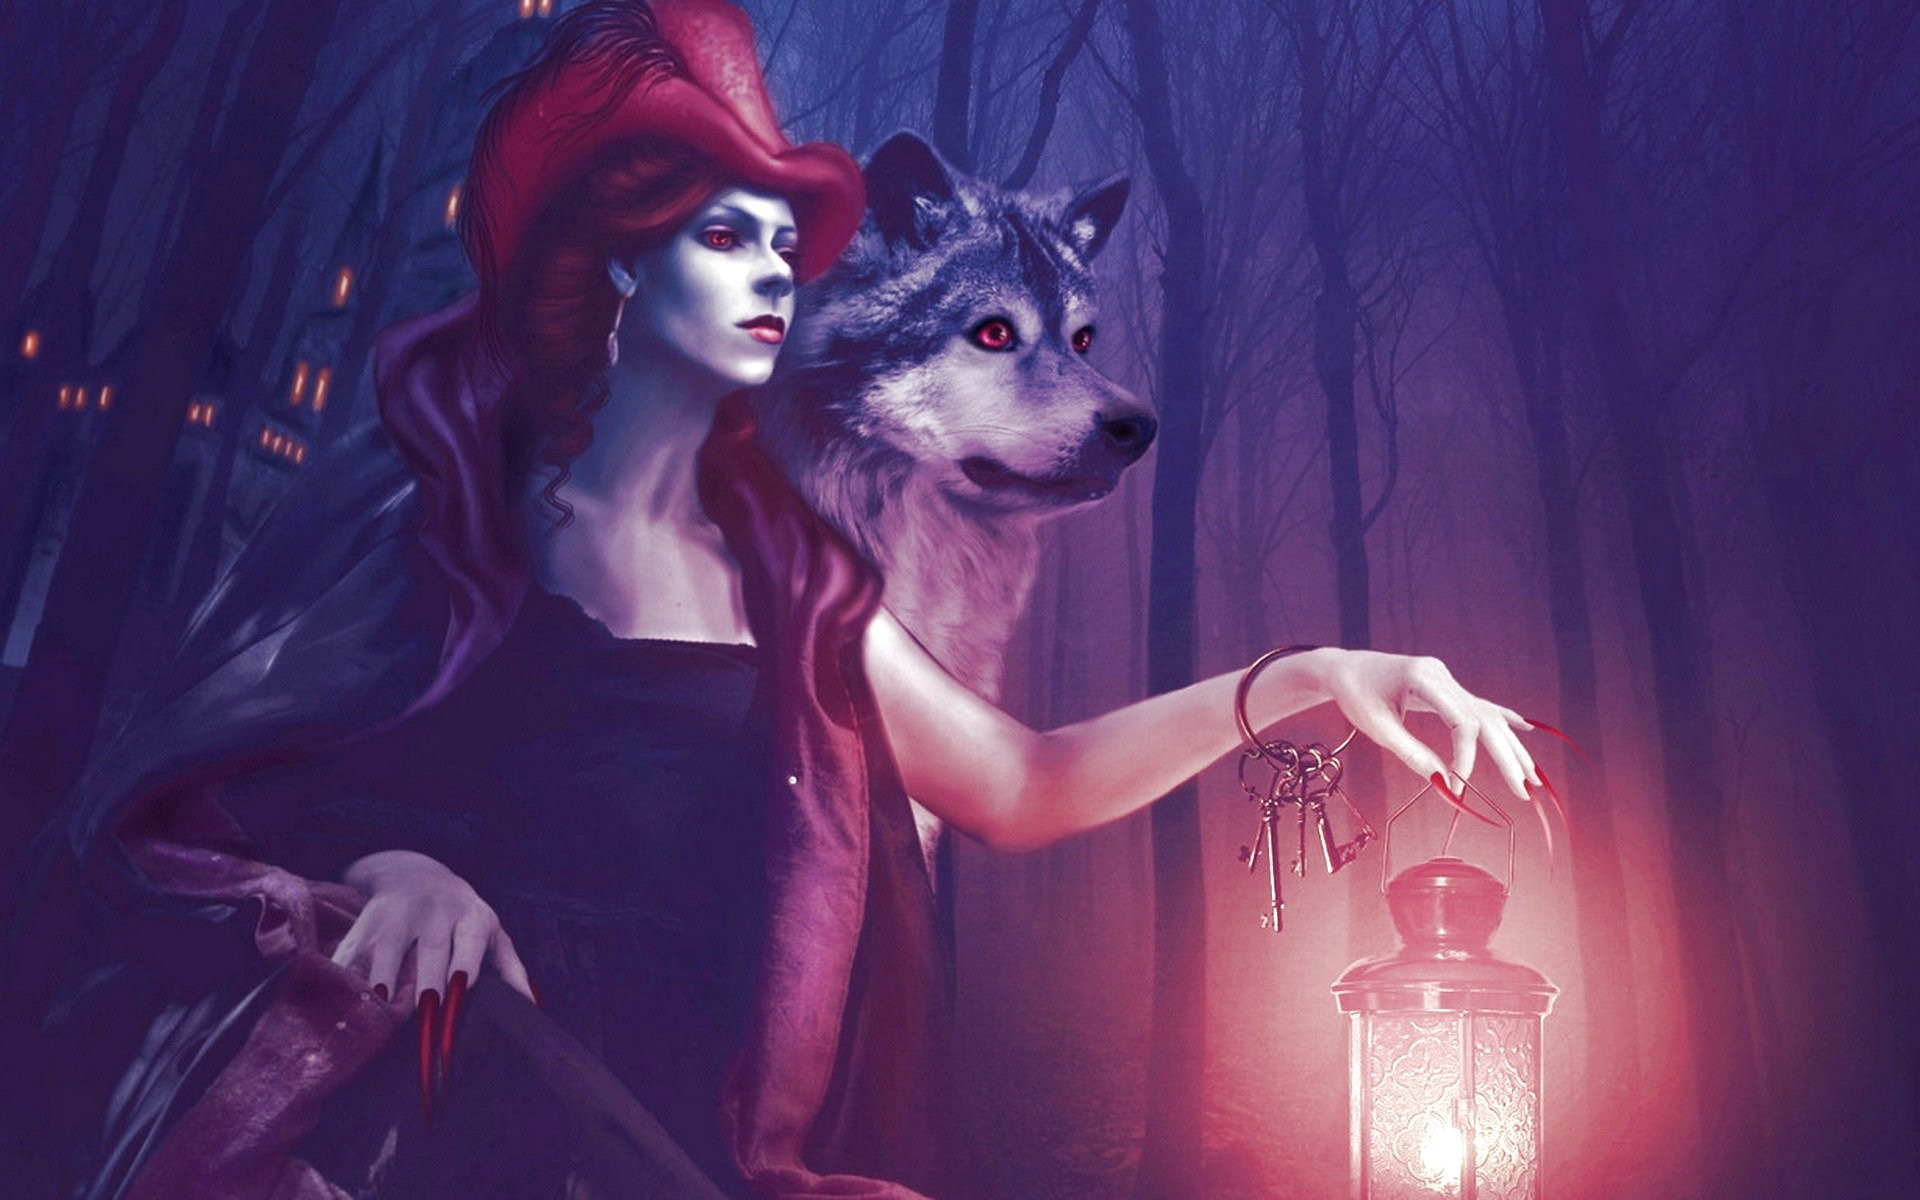 Art, Creepy, Creepy, Evil, Artwork, Original, Spooky, - Seppala Siberian Sleddog - HD Wallpaper